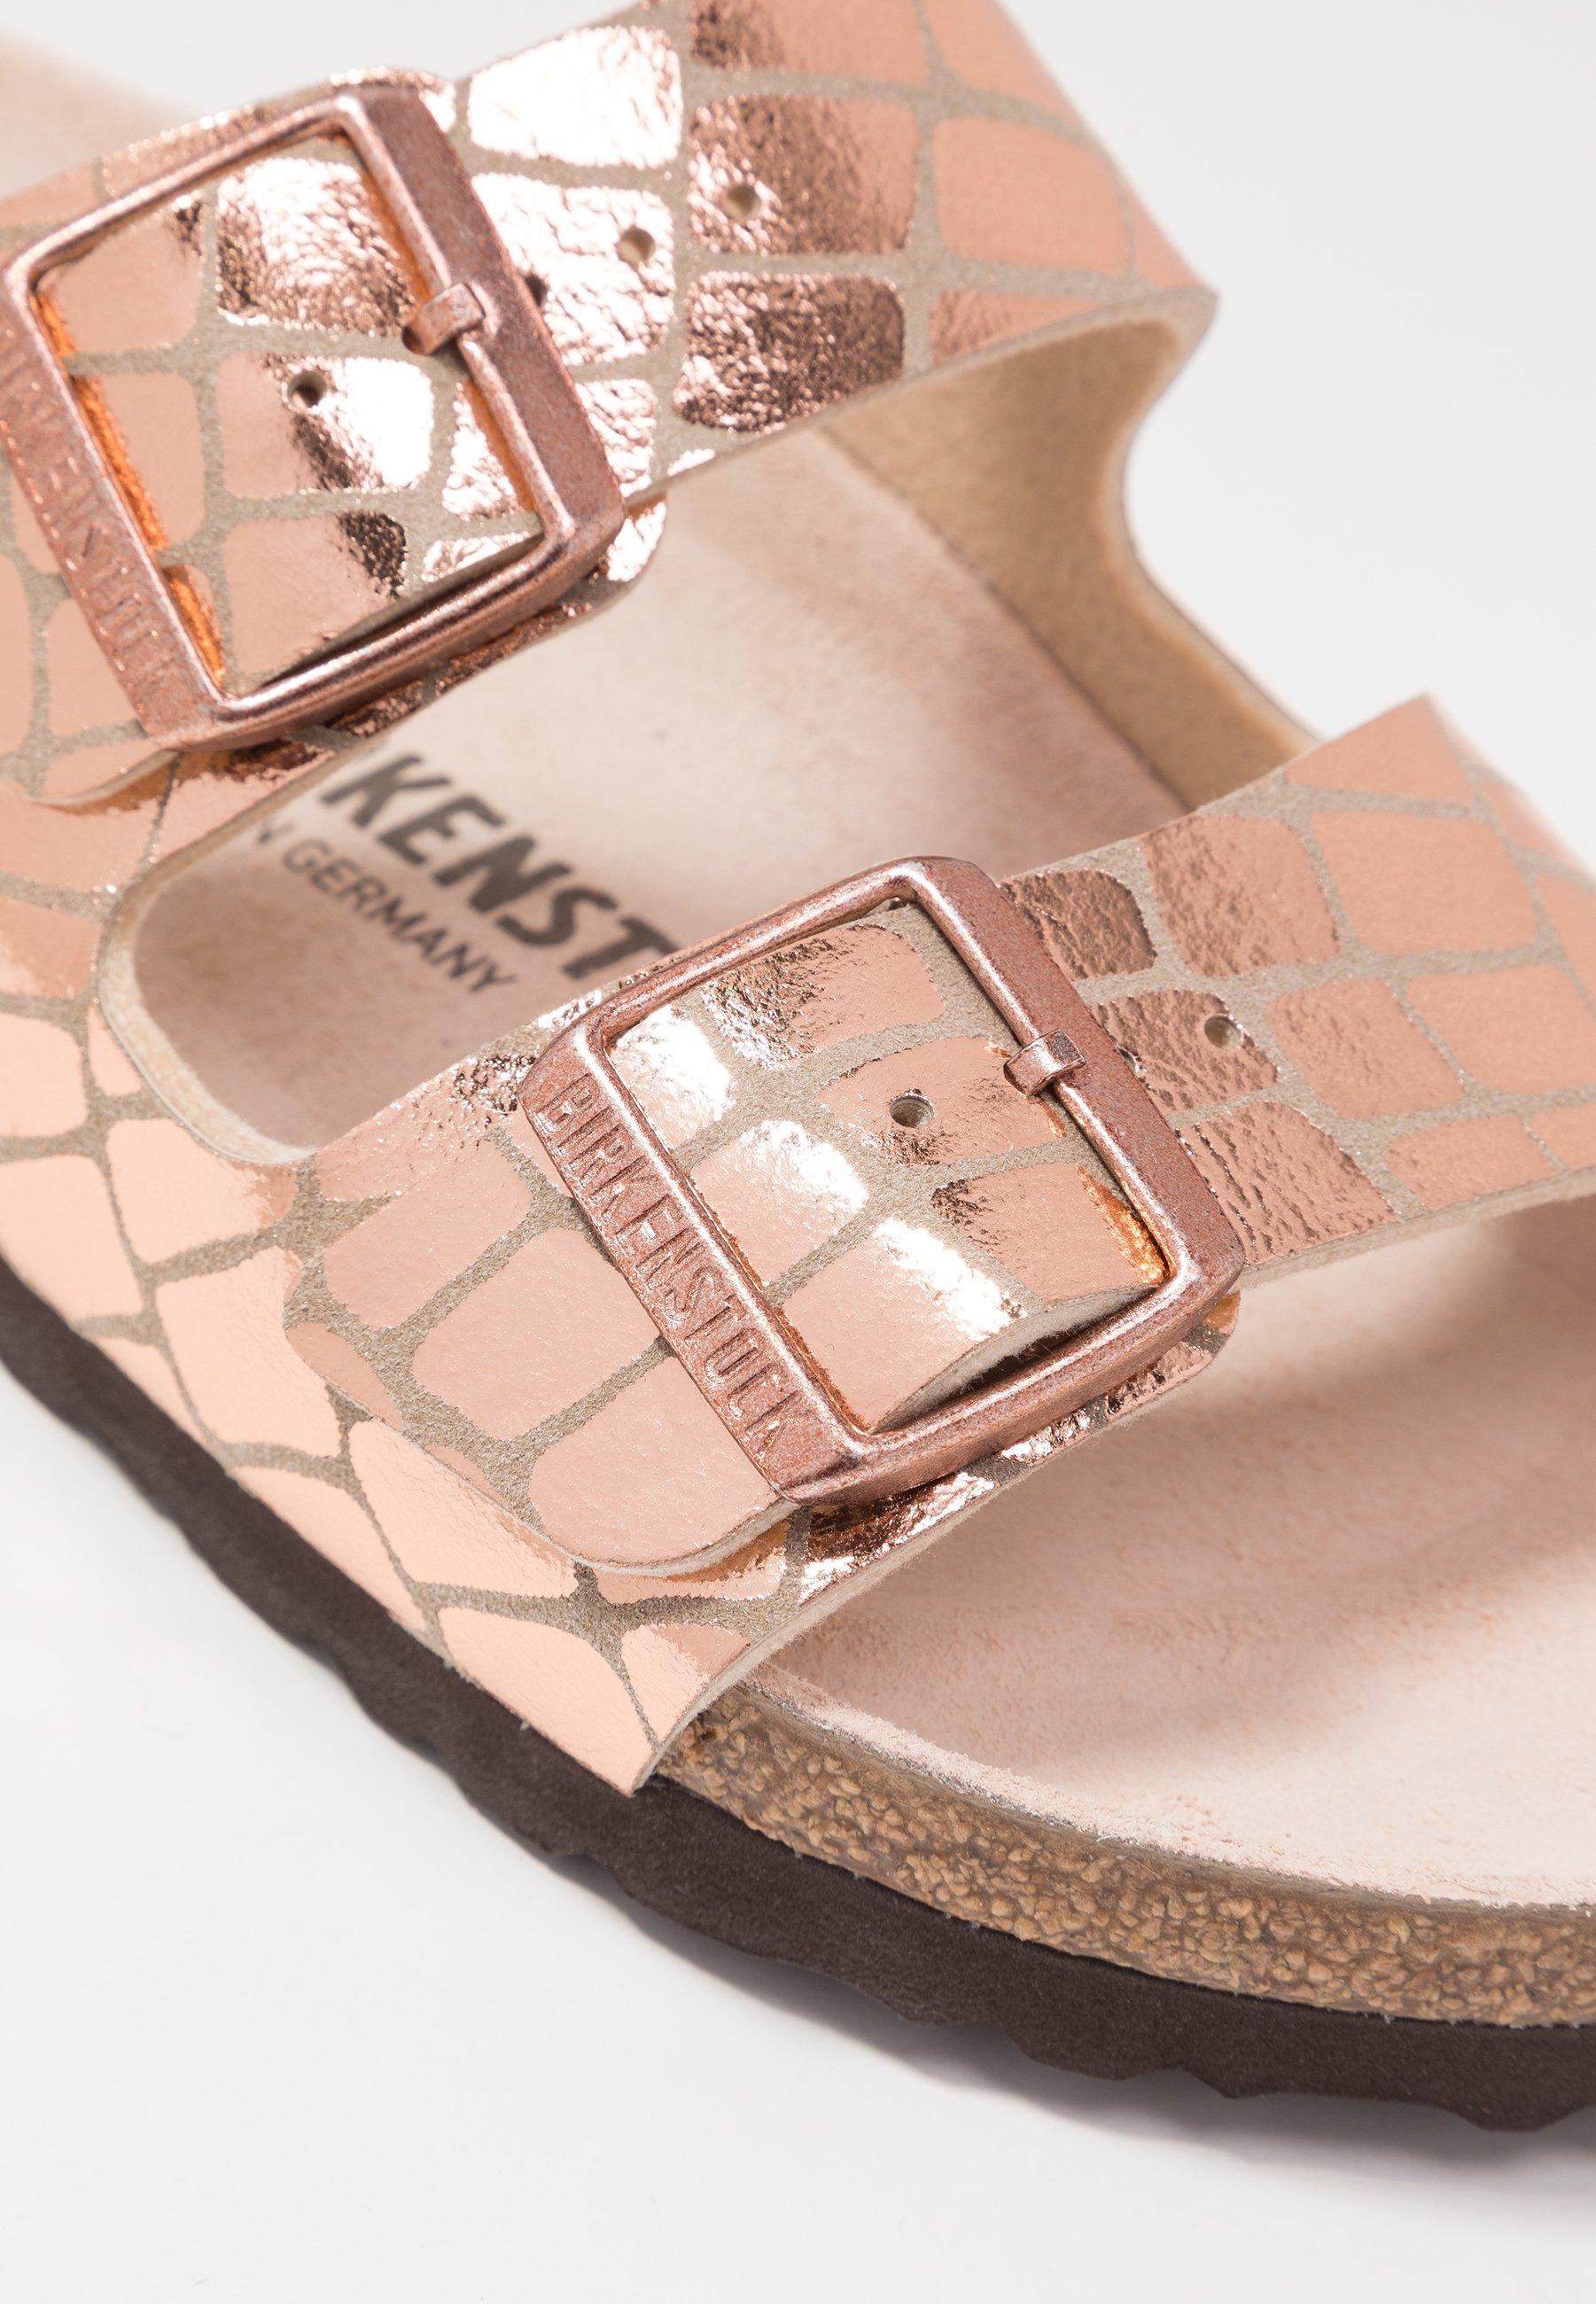 Birkenstock ARIZONA Hausschuh gator gleam copper/kupfer